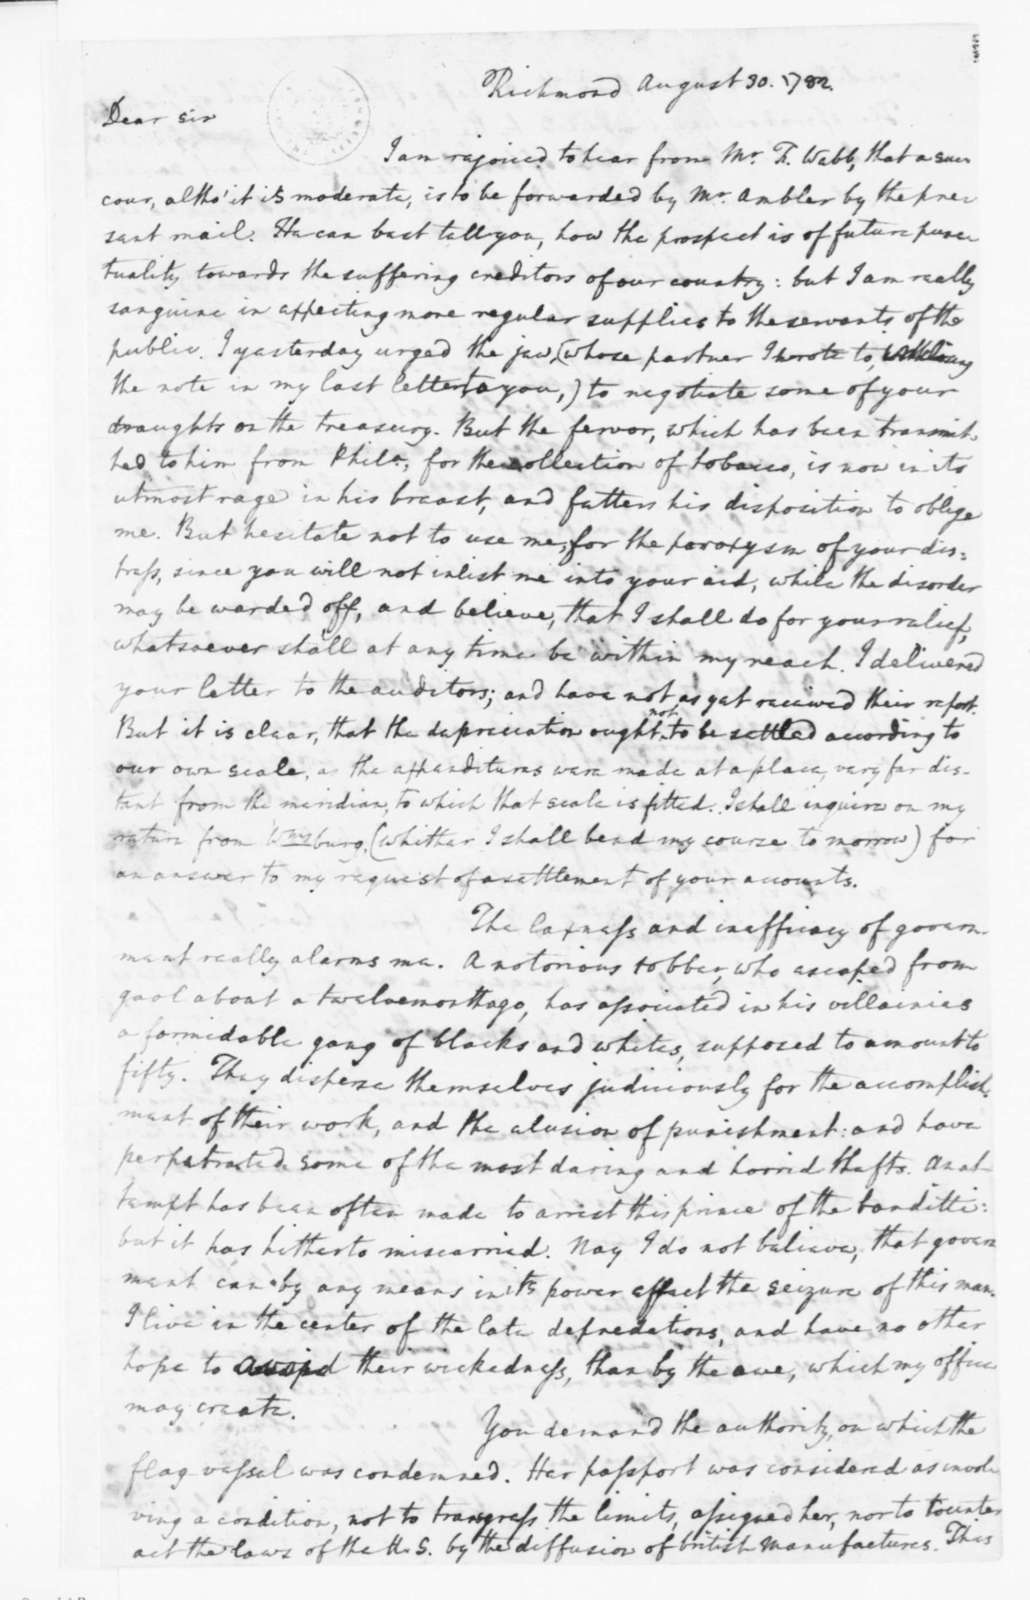 Edmund Randolph to James Madison, August 30, 1782.